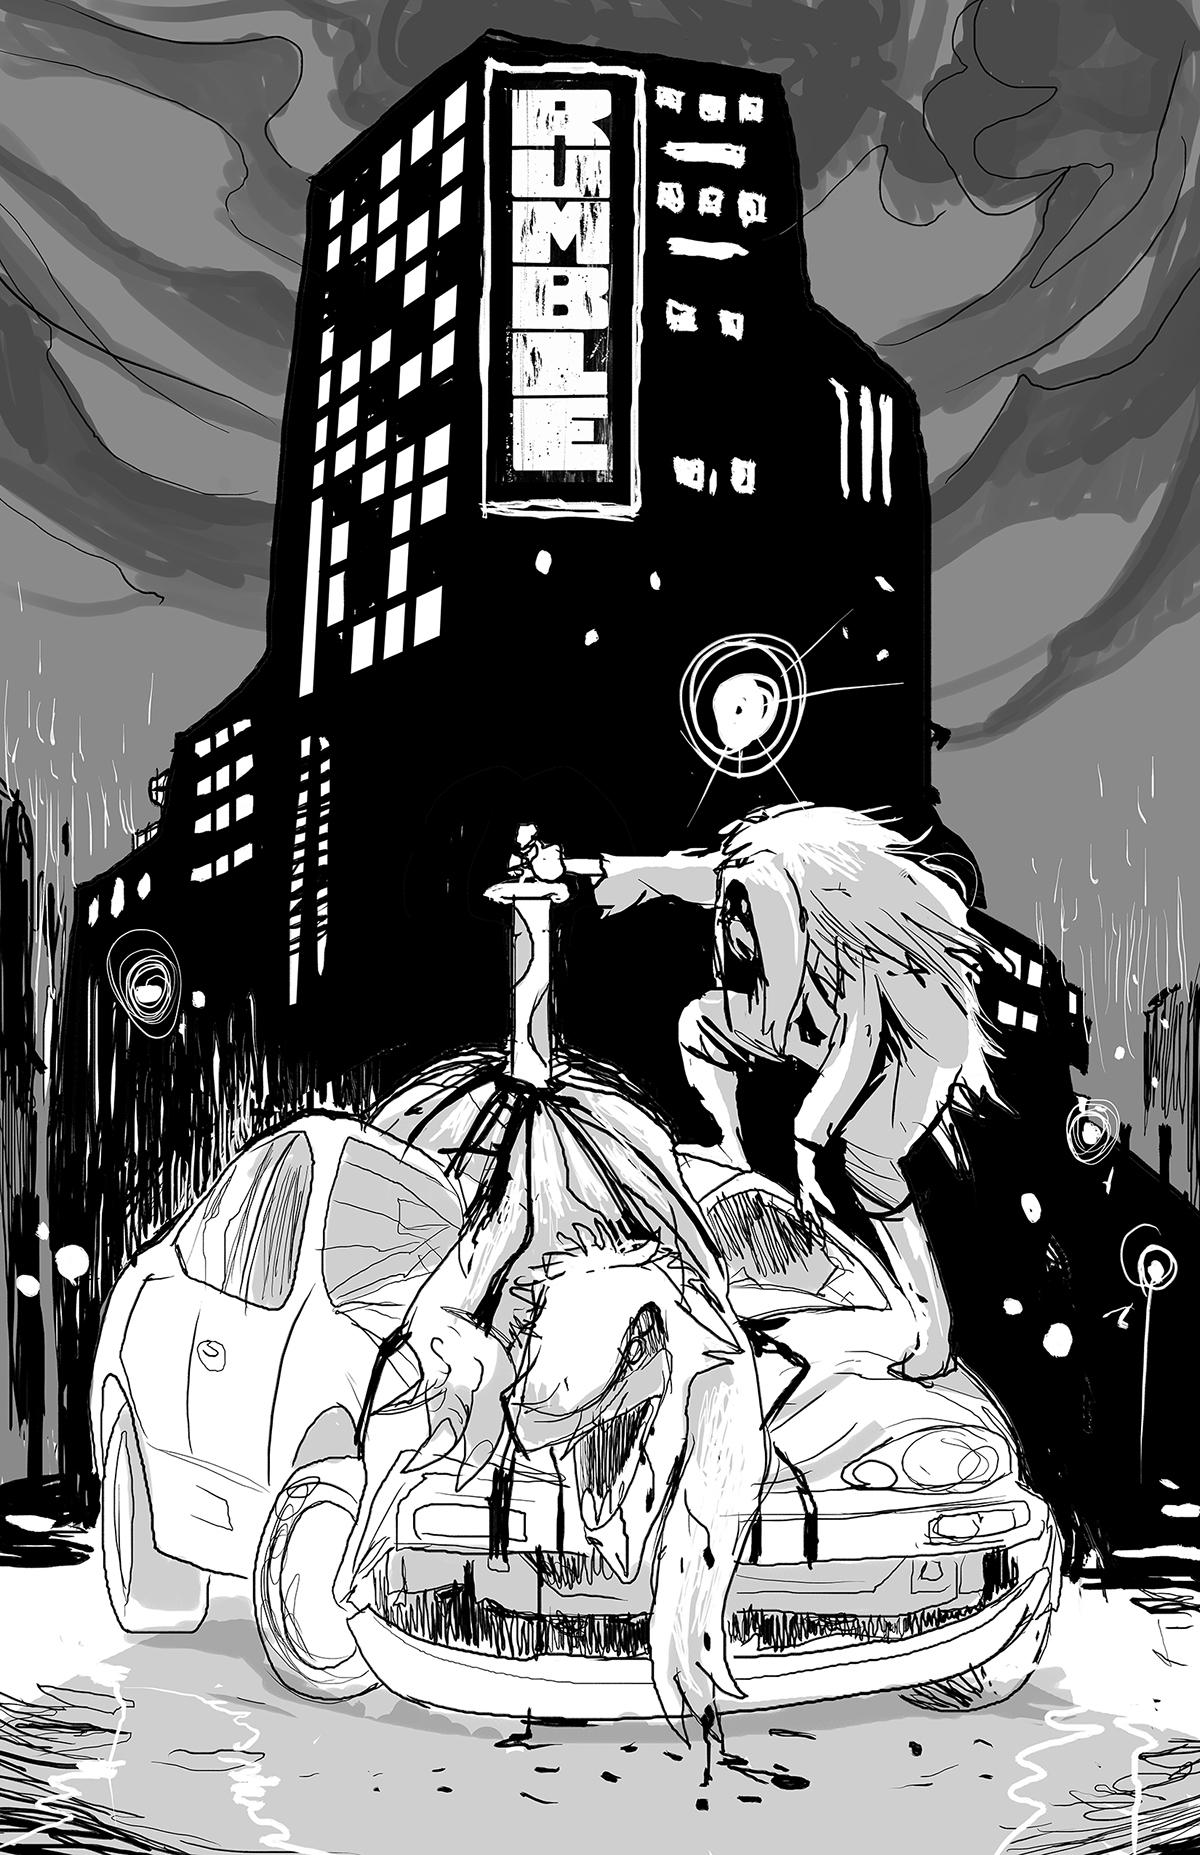 john arcudi james harren comicbook image Image Comics Rumble roc espinet citty monster car